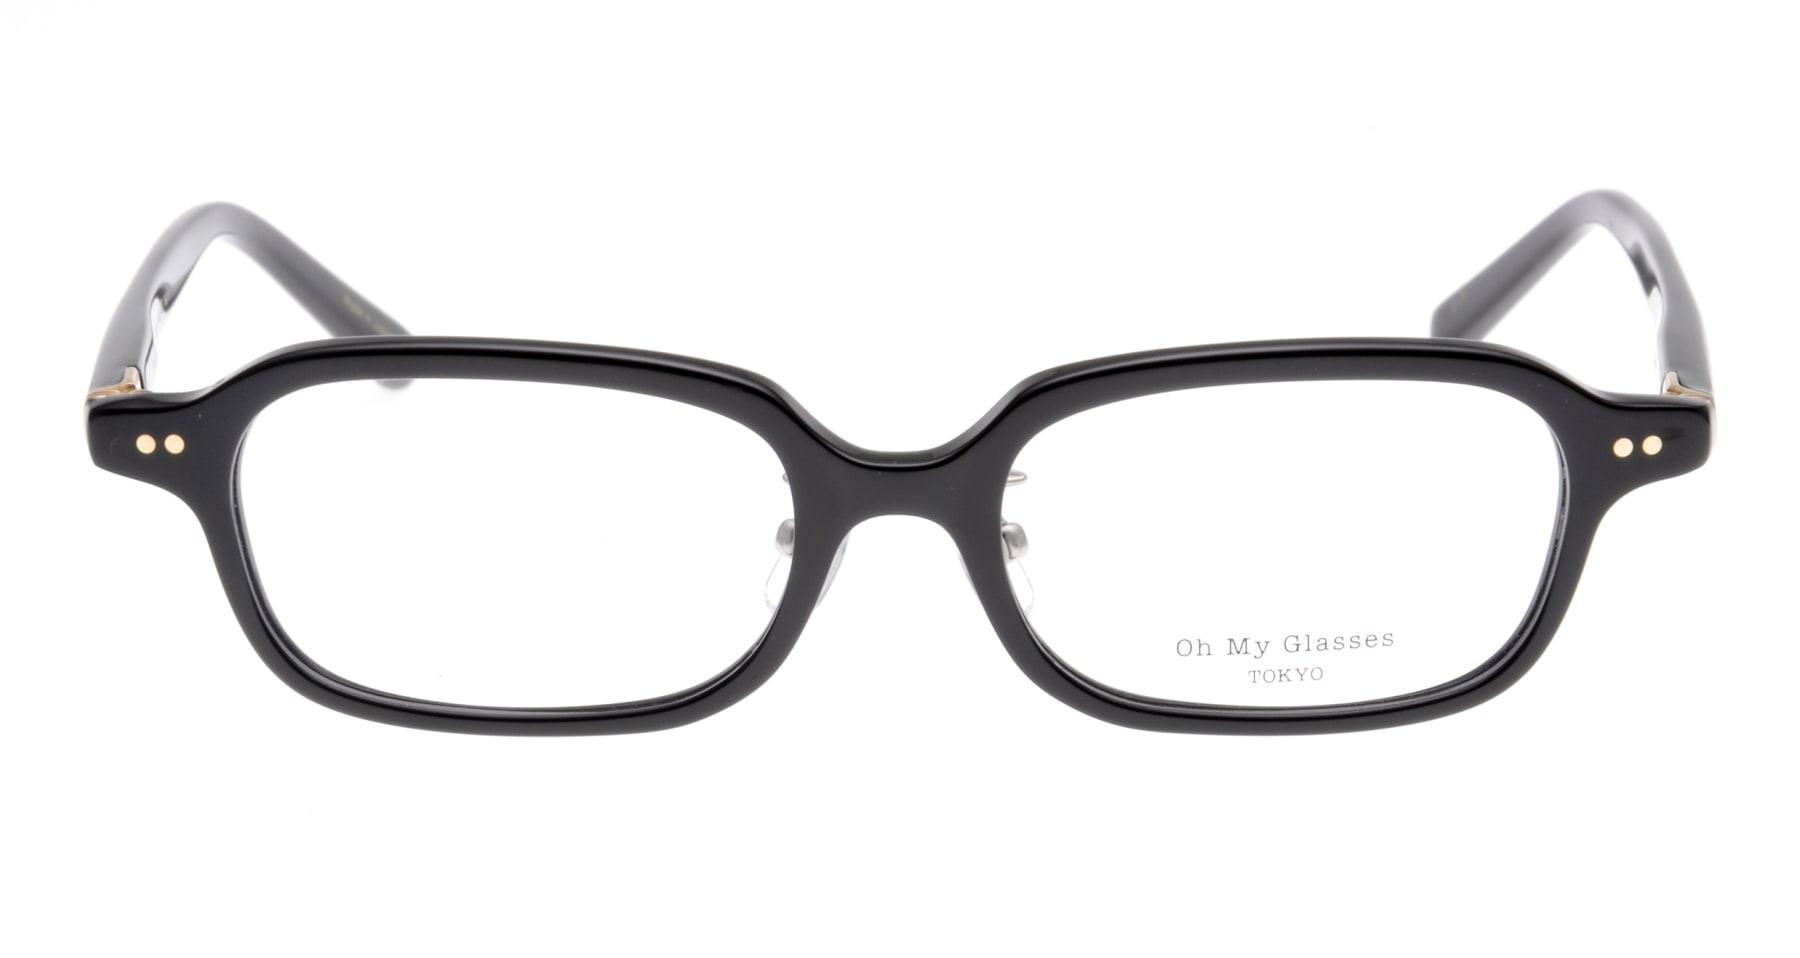 Oh My Glasses TOKYO ハリス